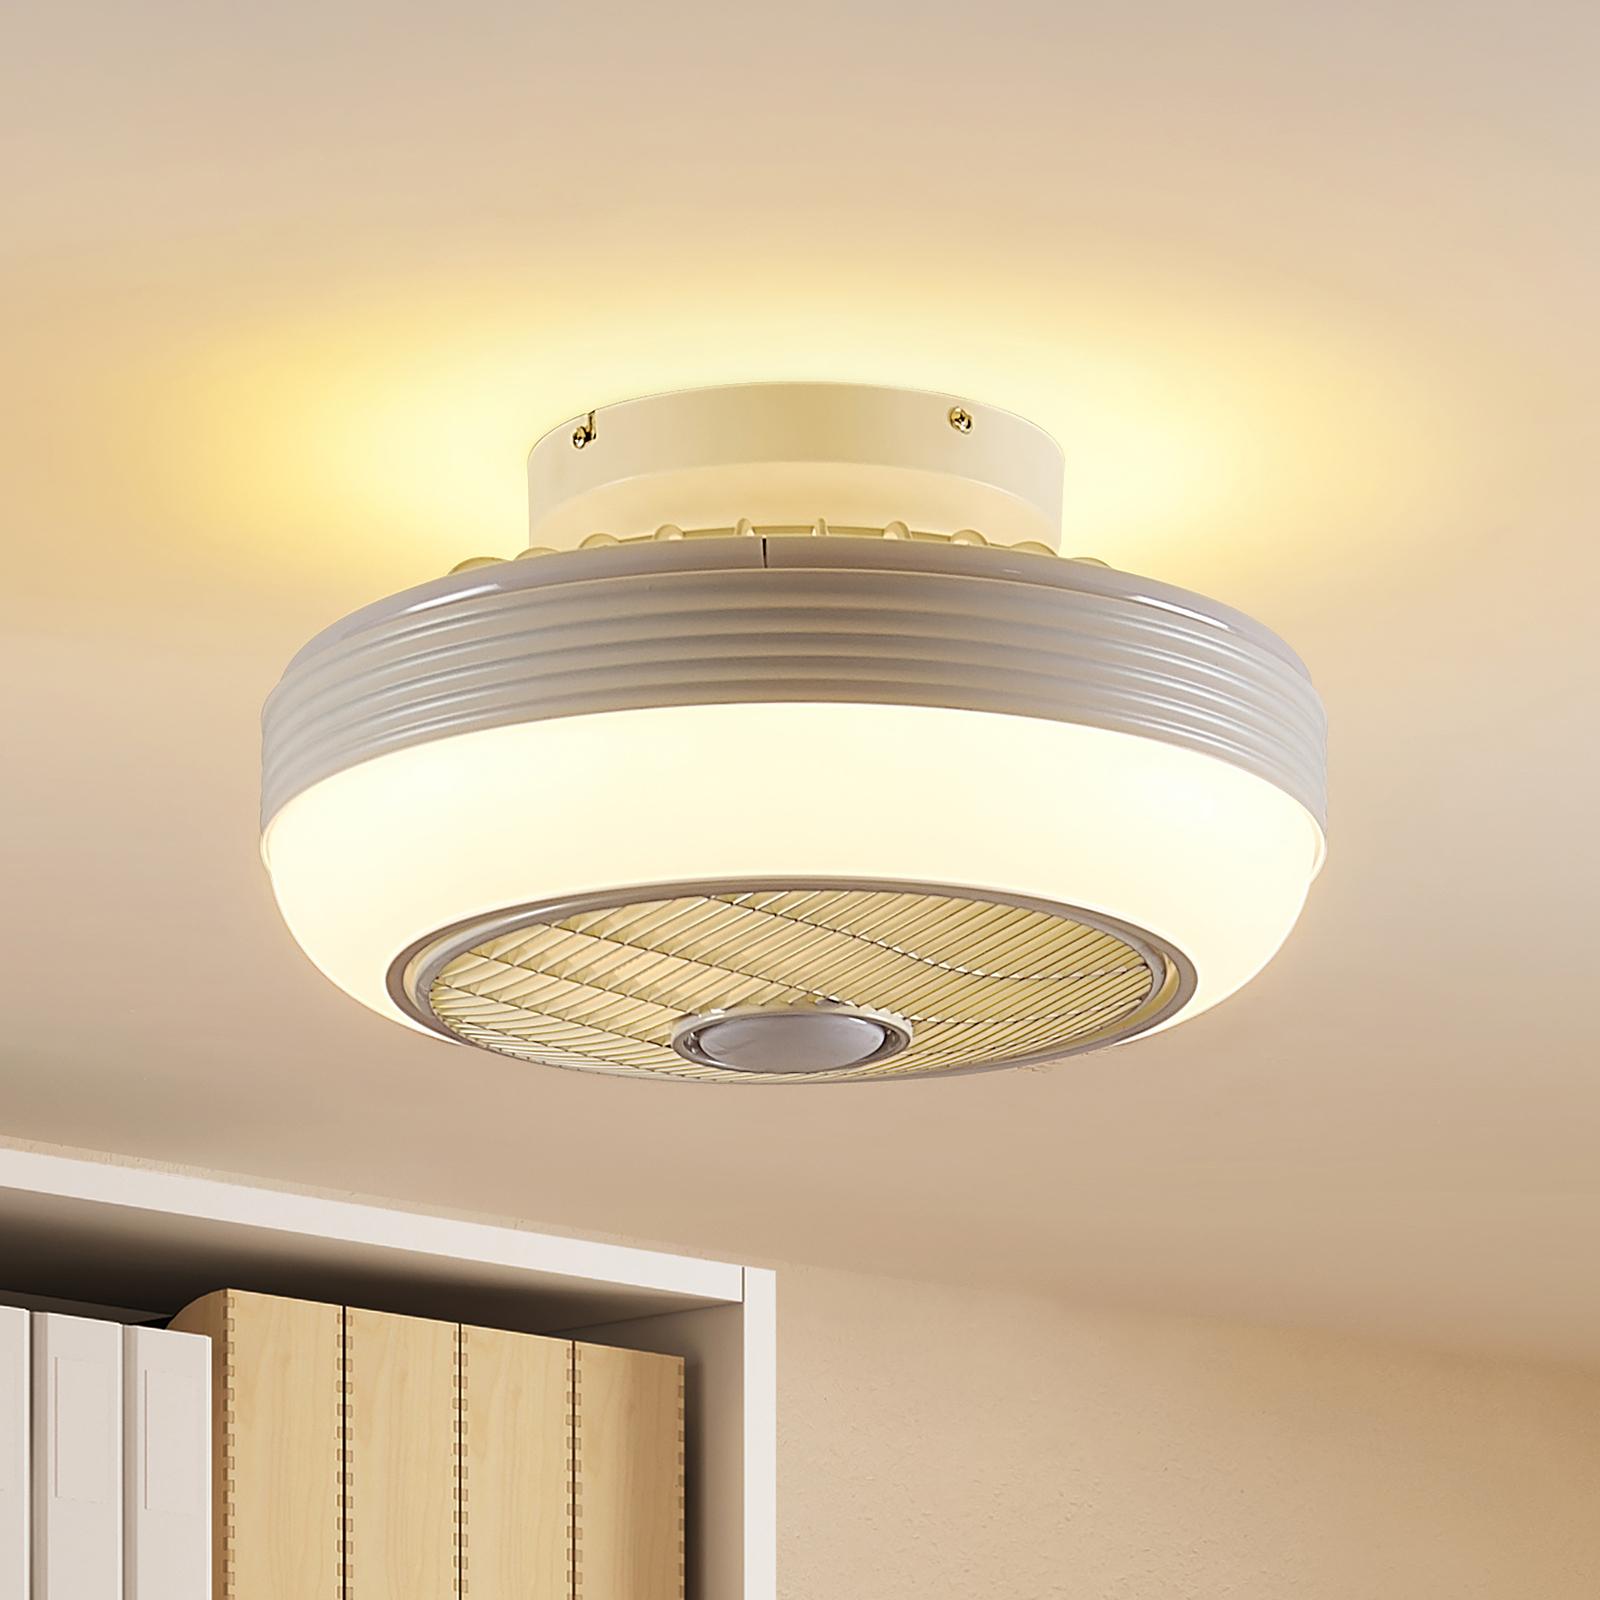 Lindby Thyron LED-loftventilator, hvid